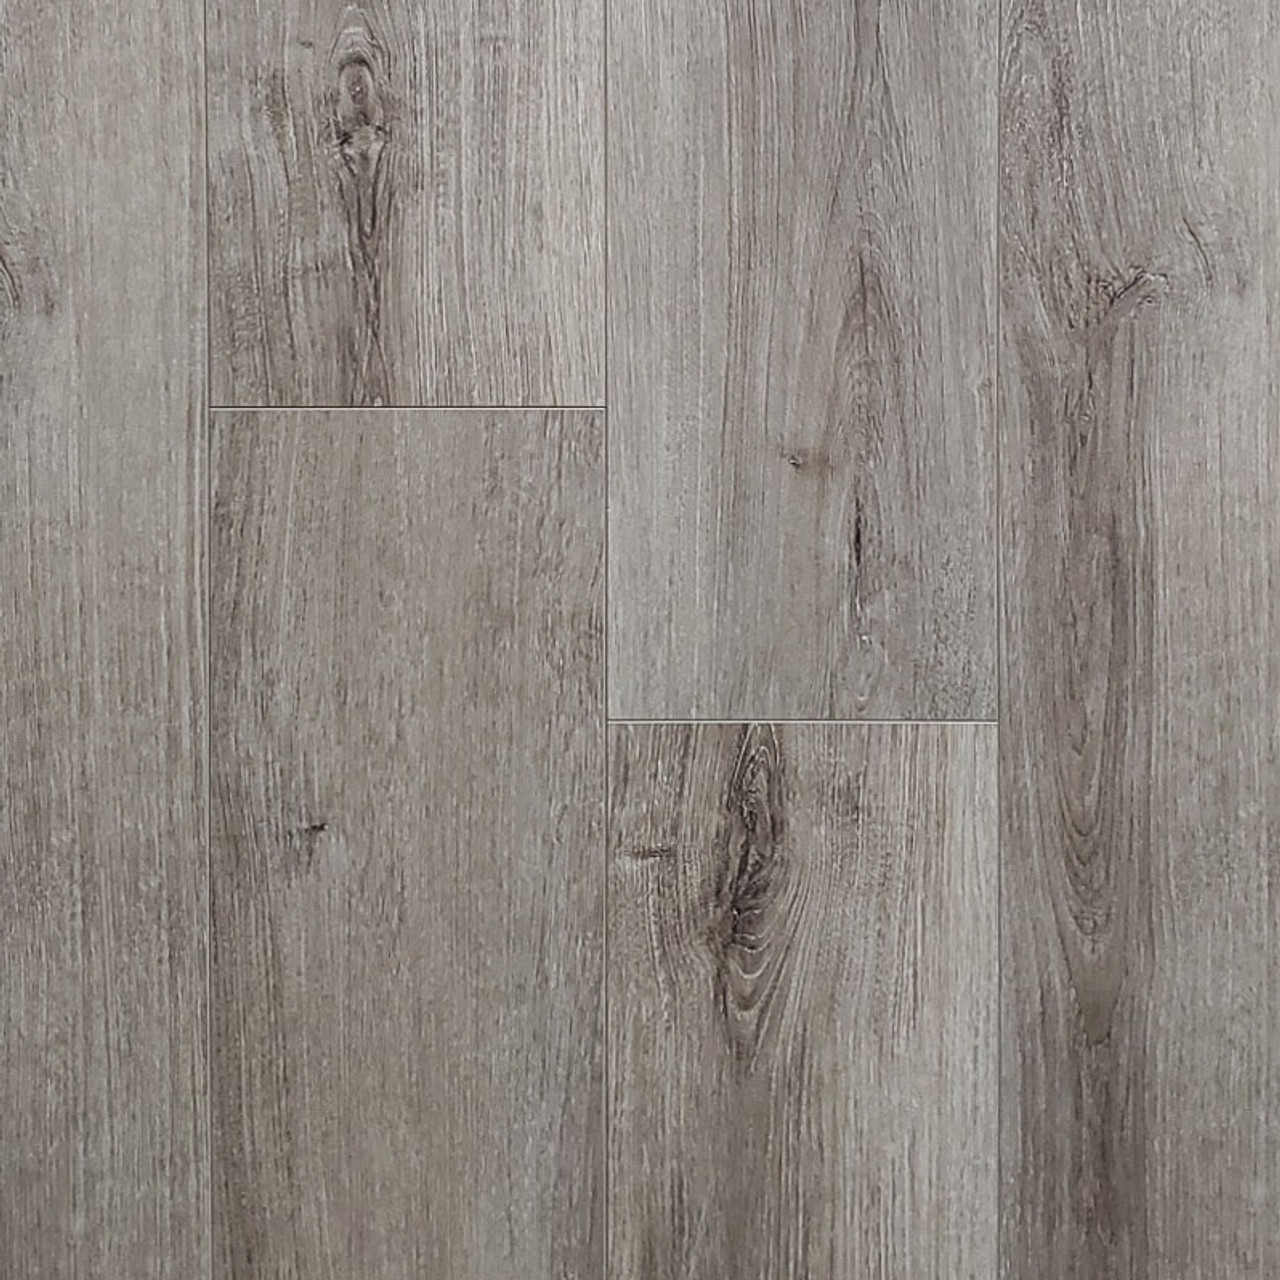 12mm Regalia Entwine Laminate Flooring   15.42 Sq.Ft. Per Box   Sold by the Box